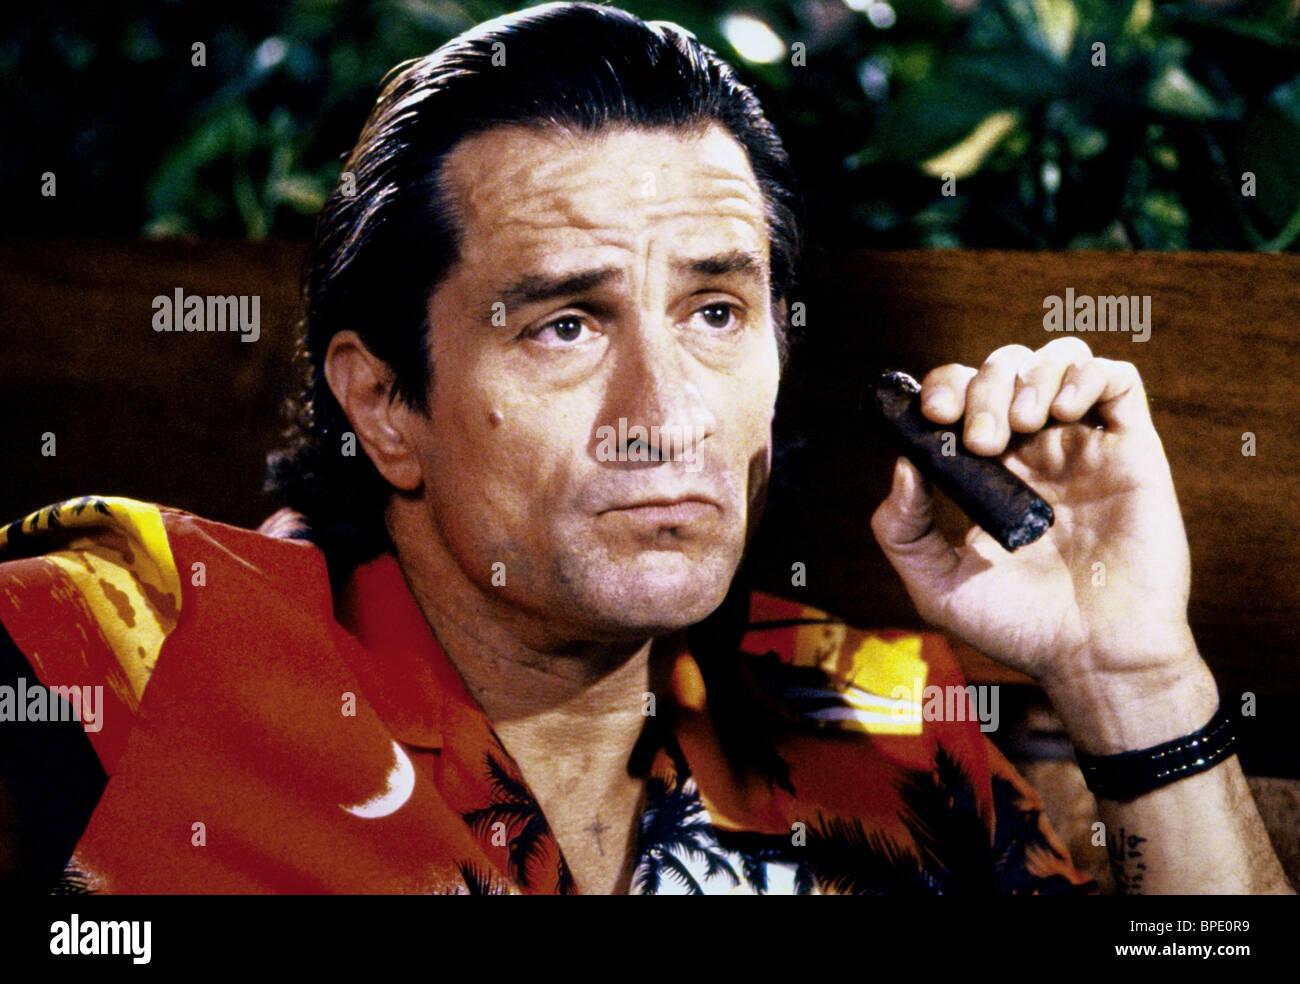 ROBERT DE NIRO CAPE FEAR (1991) Stock Photo